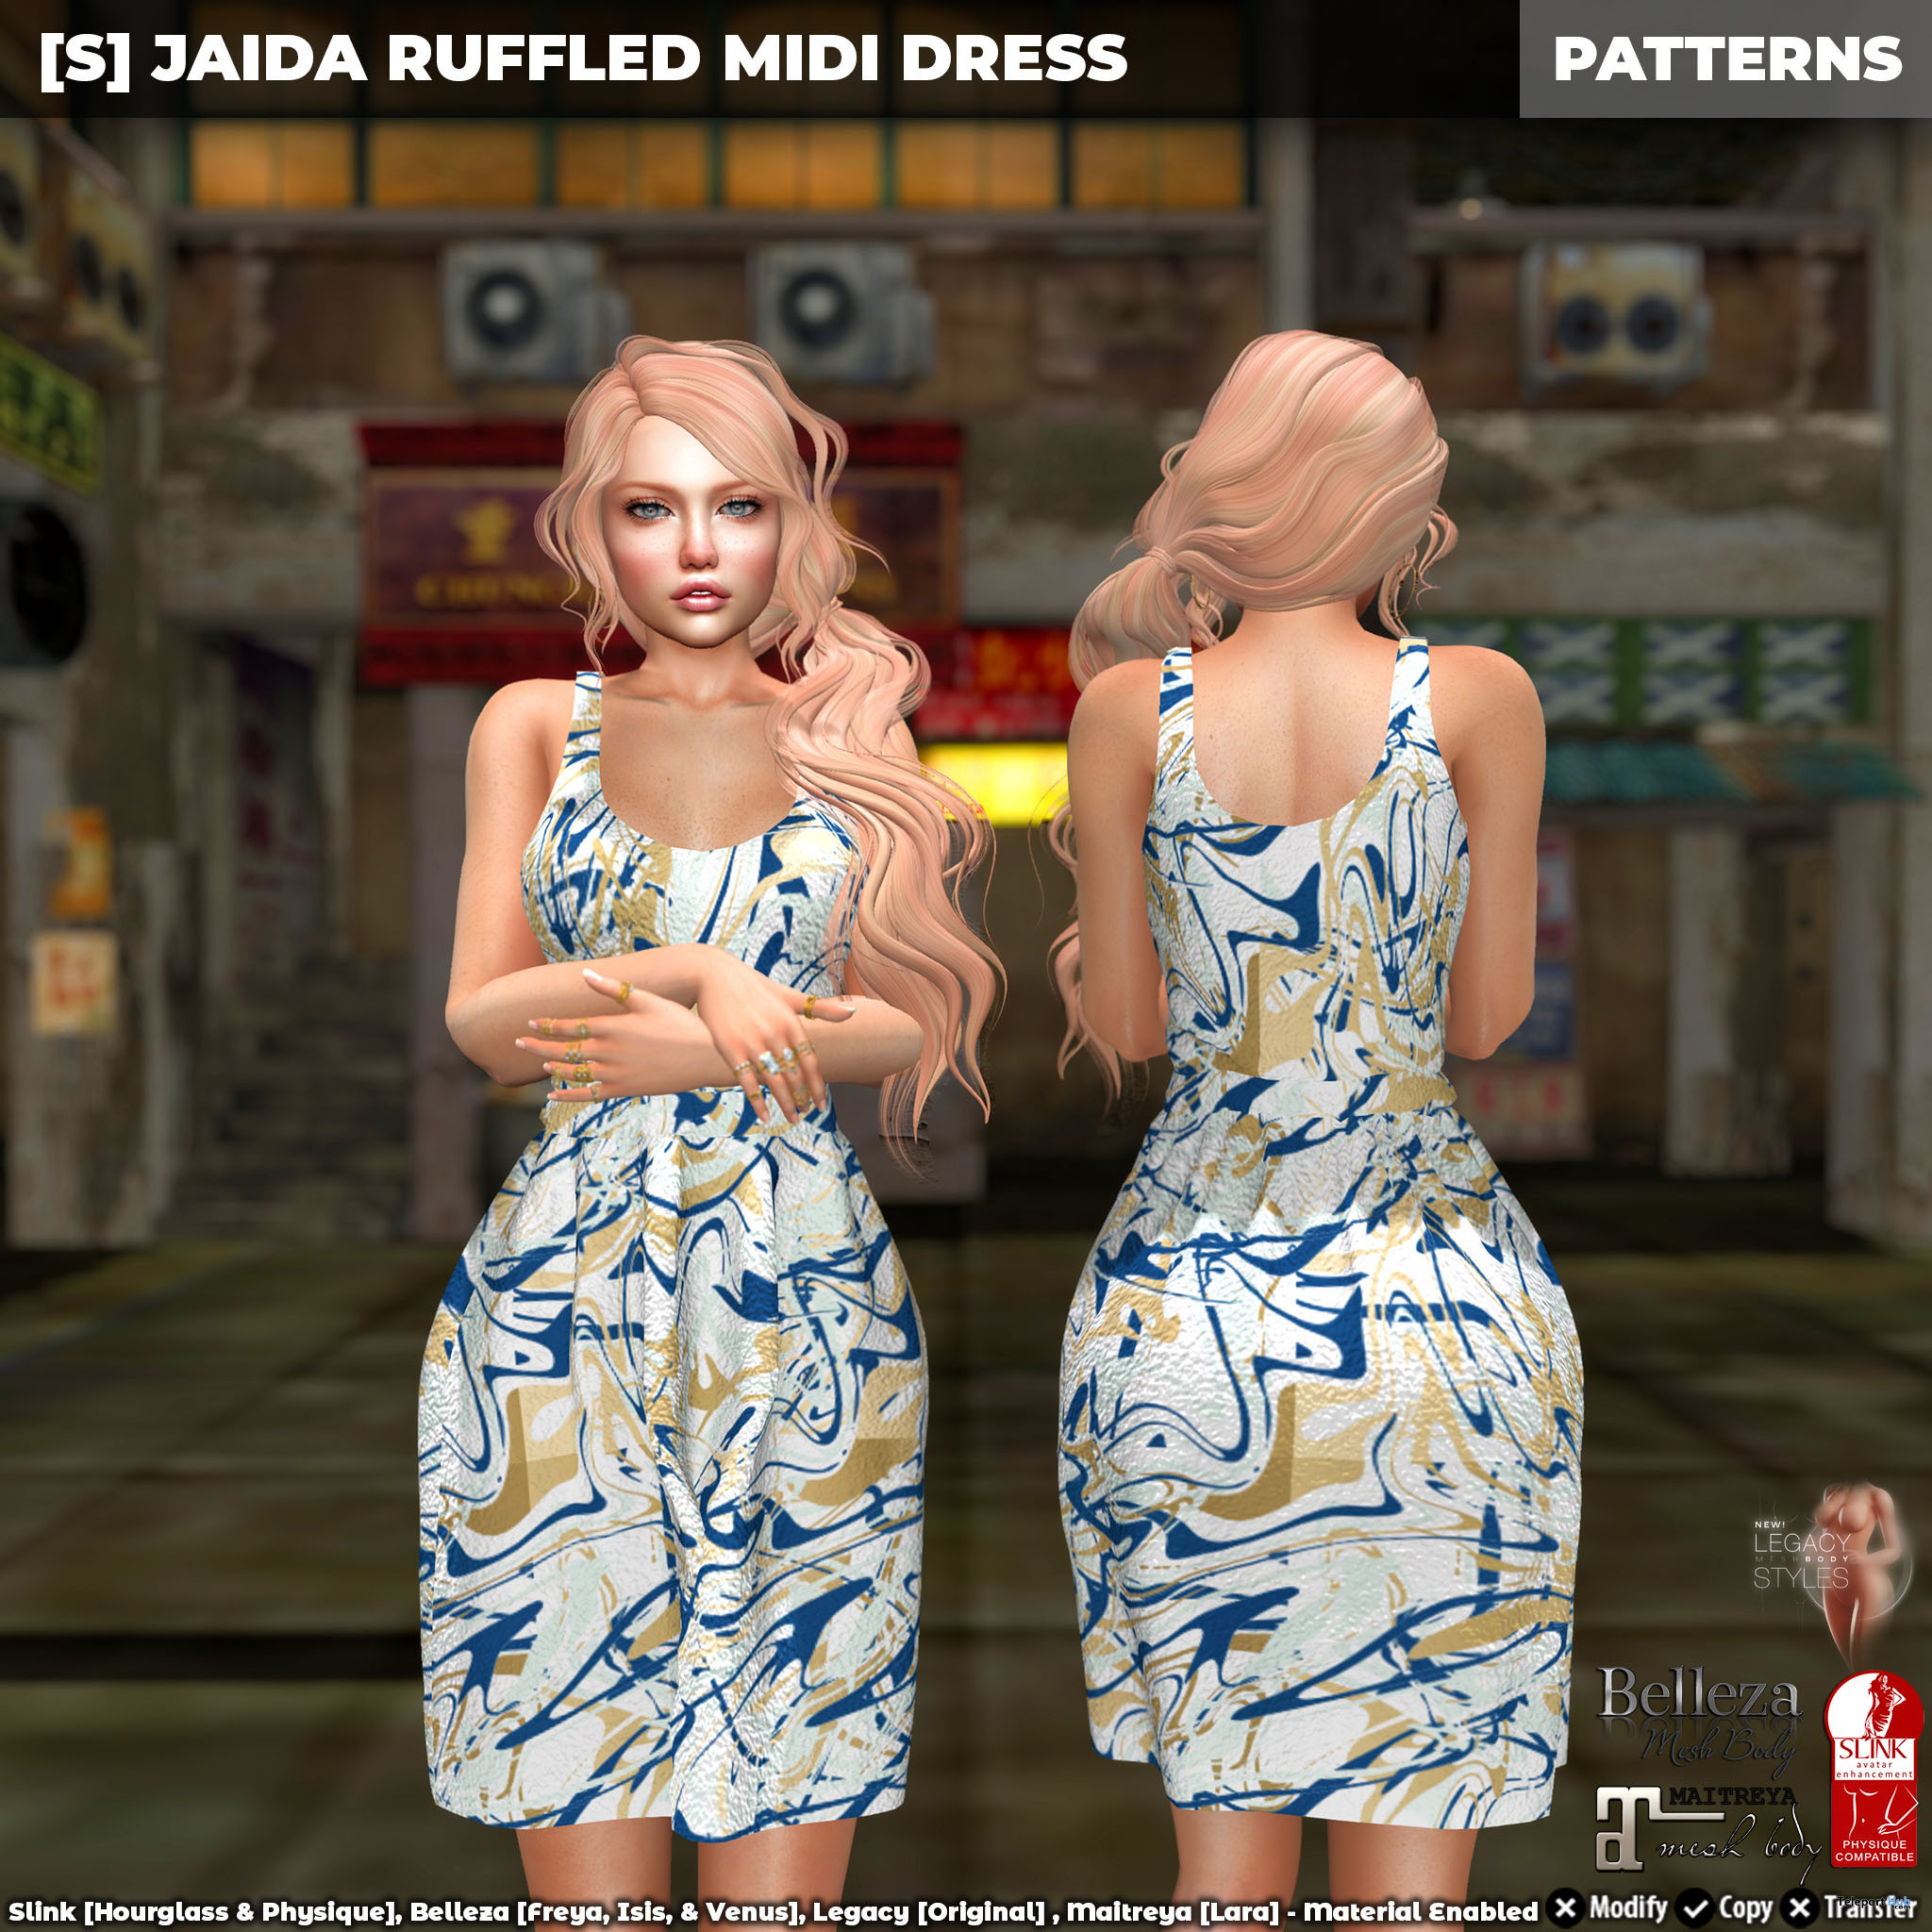 New Release: [S] Jaida Ruffled Midi Dress by [satus Inc] - Teleport Hub - teleporthub.com